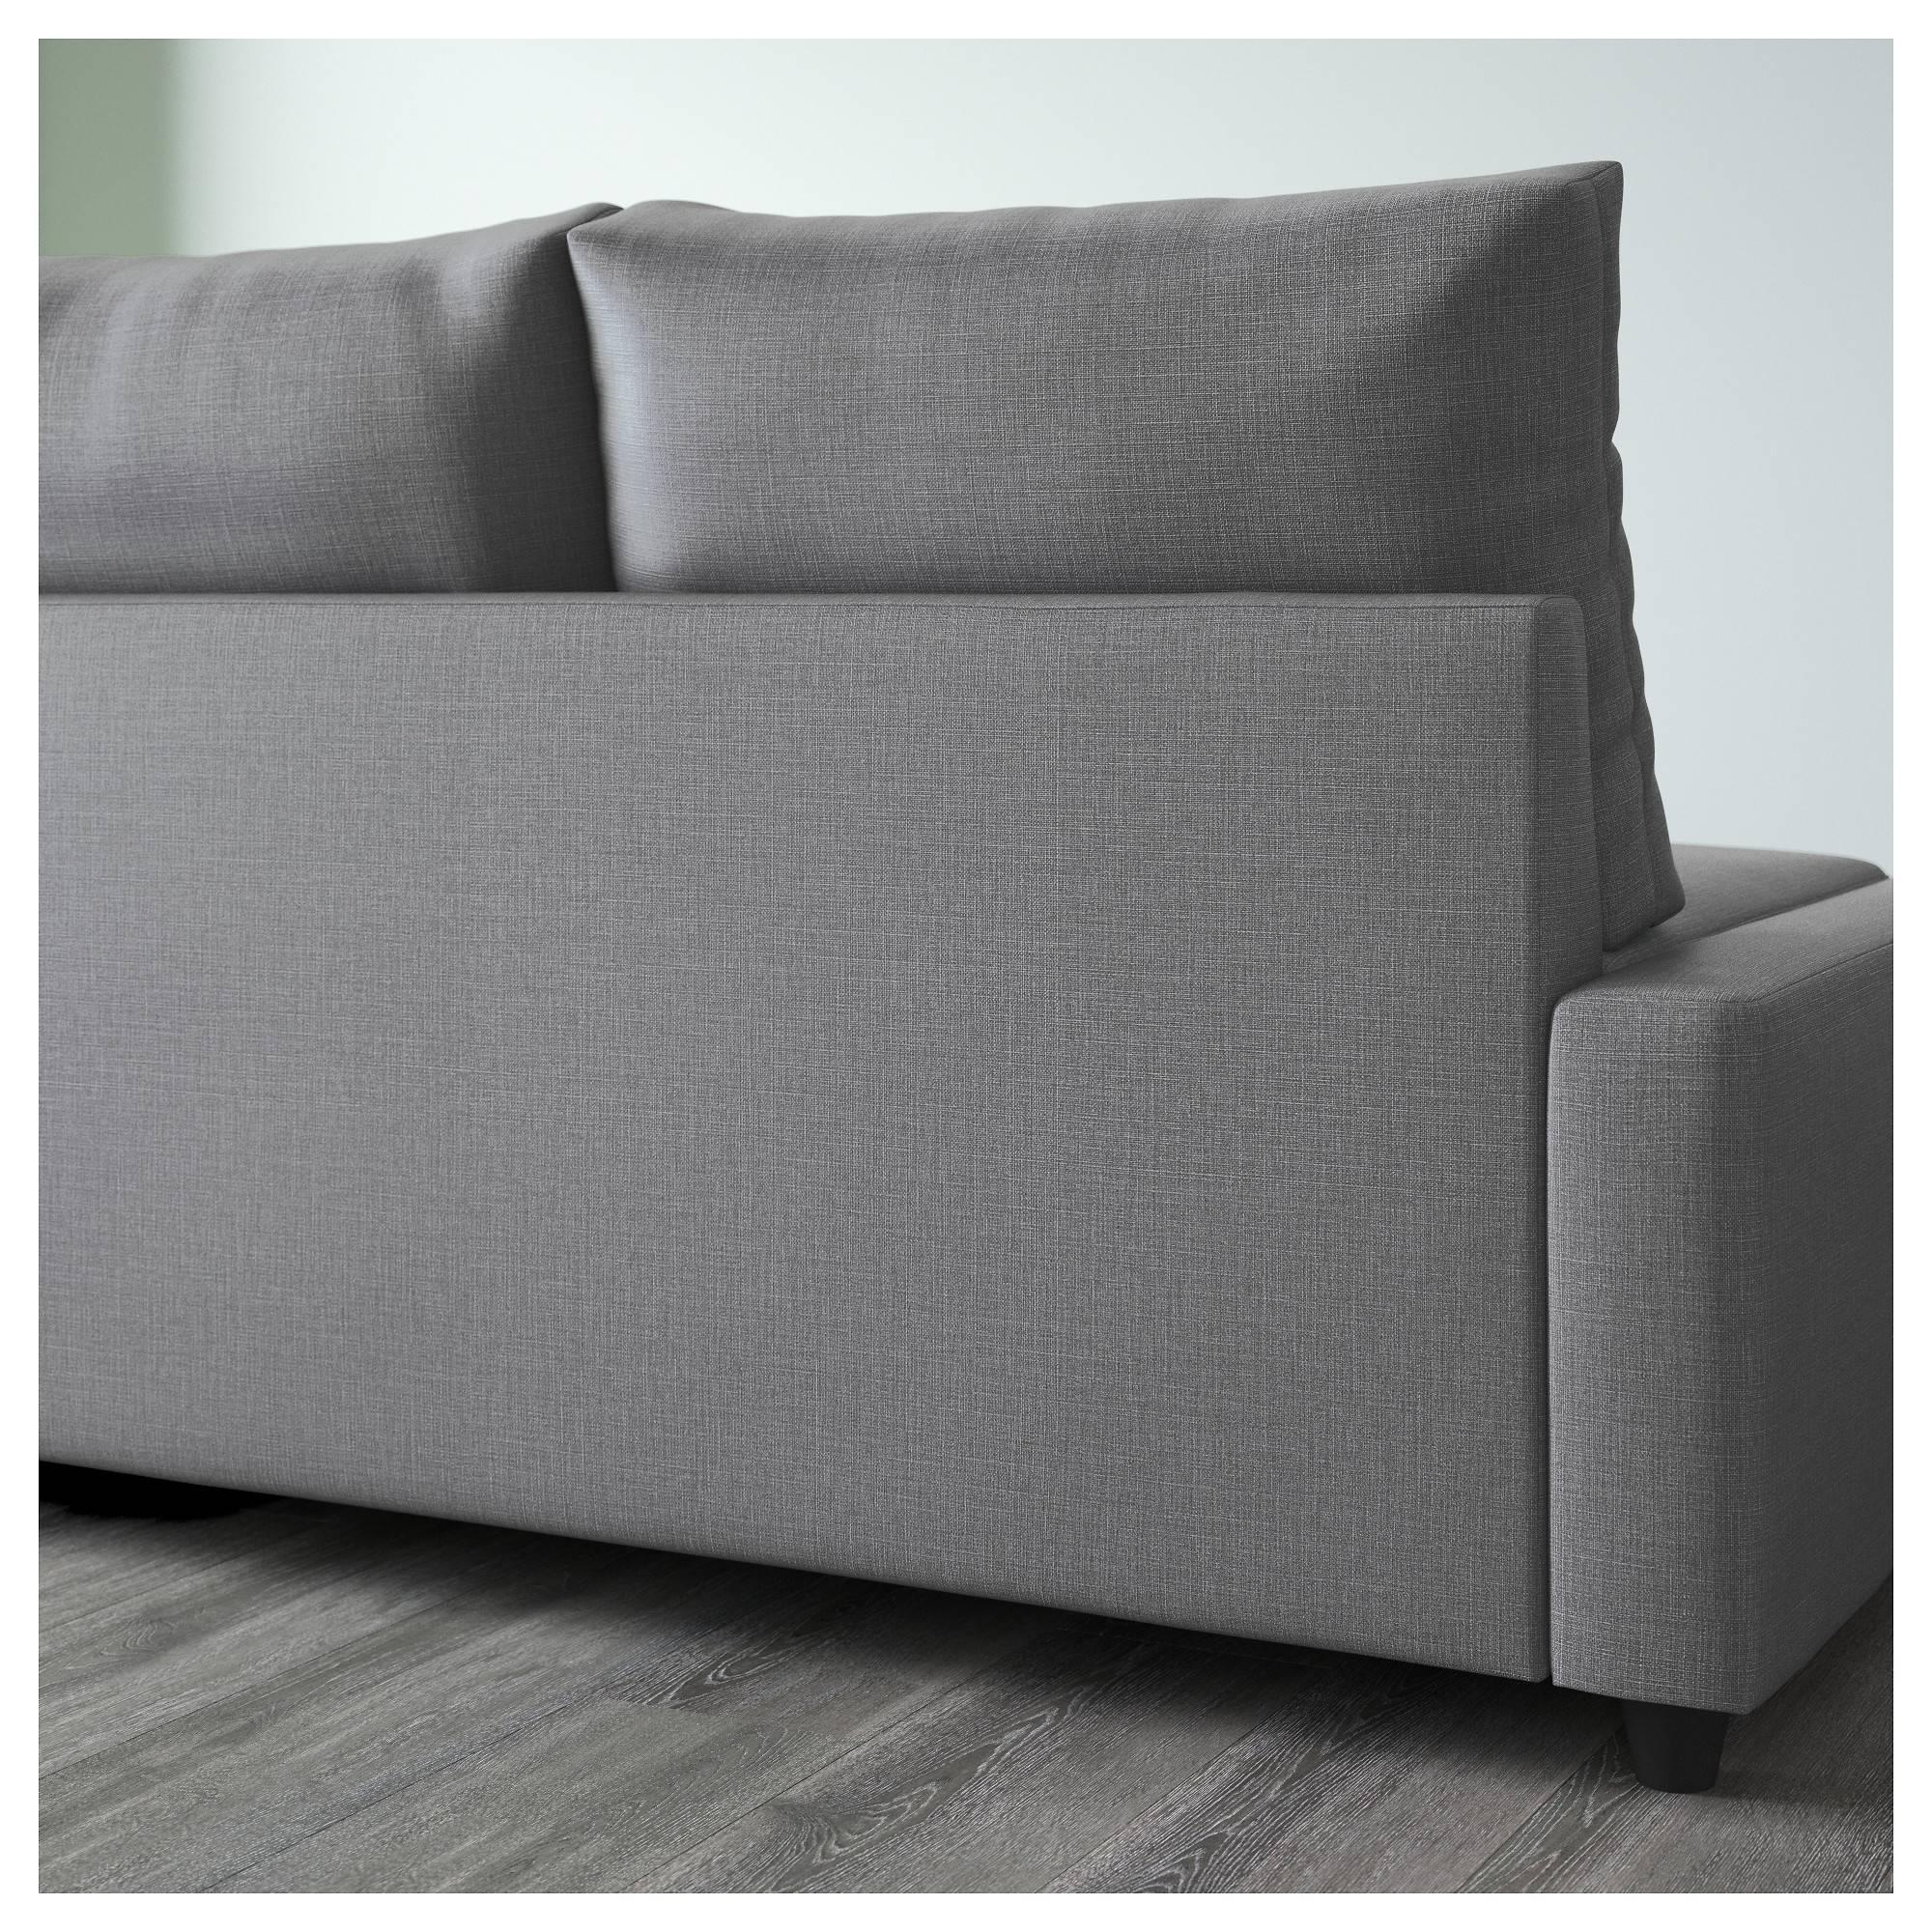 Friheten Corner Sofa-Bed With Storage Skiftebo Dark Grey - Ikea for Storage Sofas Ikea (Image 6 of 25)